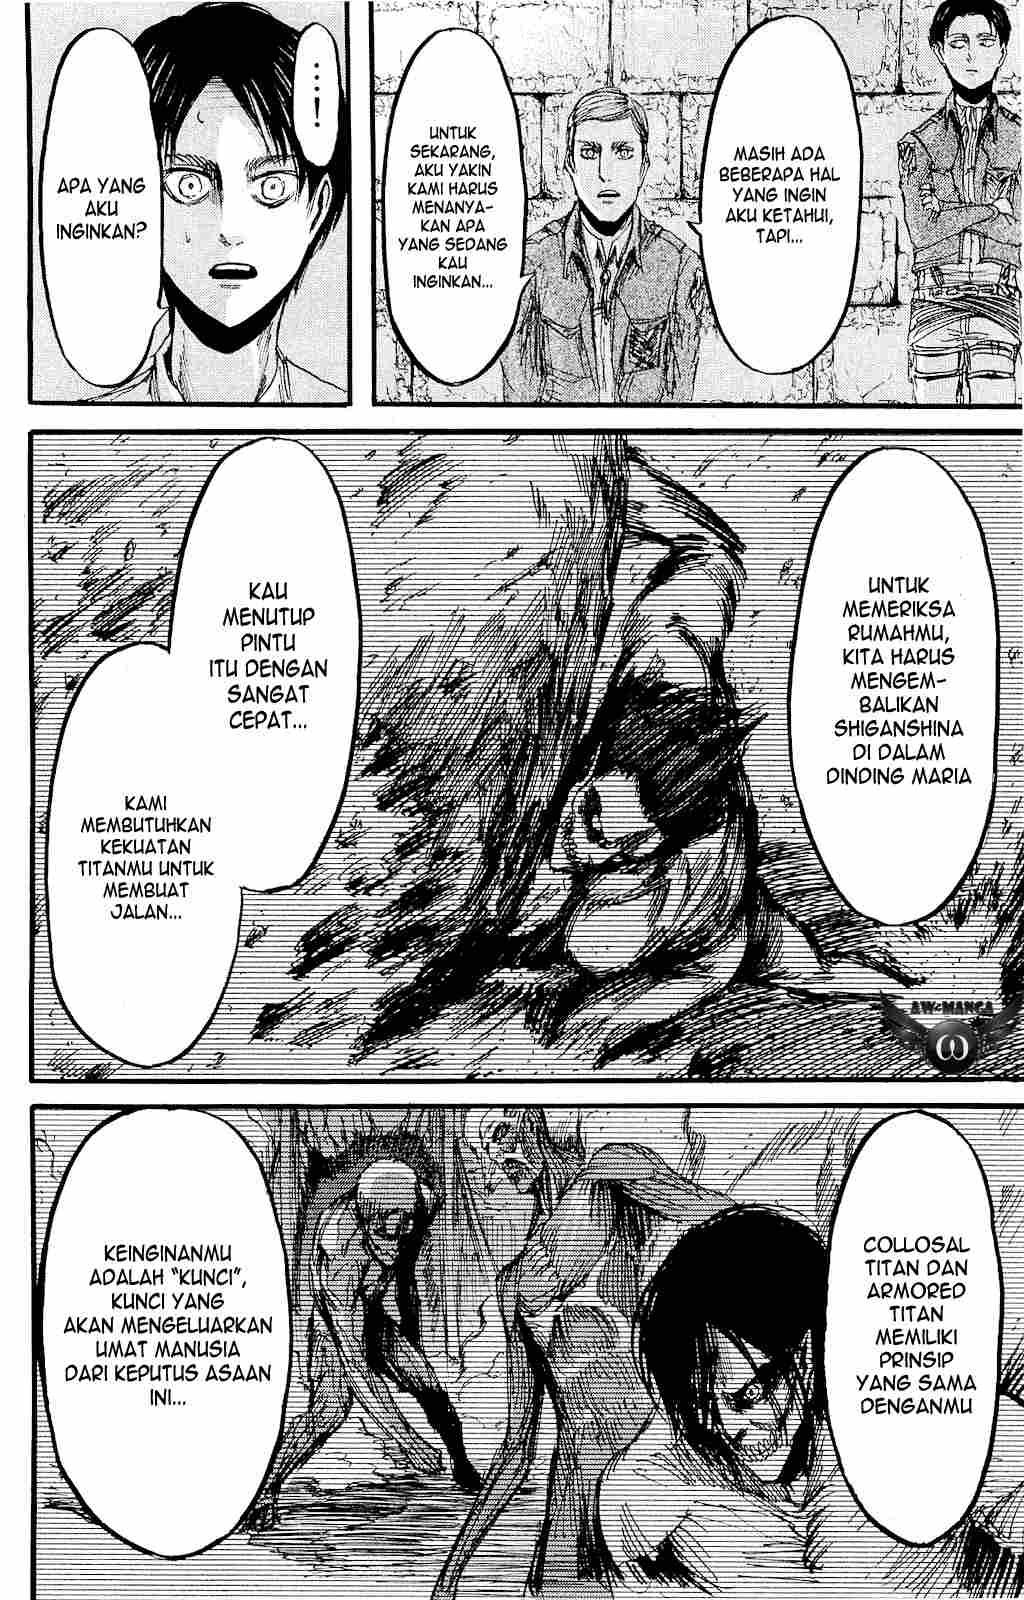 Komik shingeki no kyojin 018 - sekarang apa yang harus dilakukan 19 Indonesia shingeki no kyojin 018 - sekarang apa yang harus dilakukan Terbaru 37|Baca Manga Komik Indonesia|